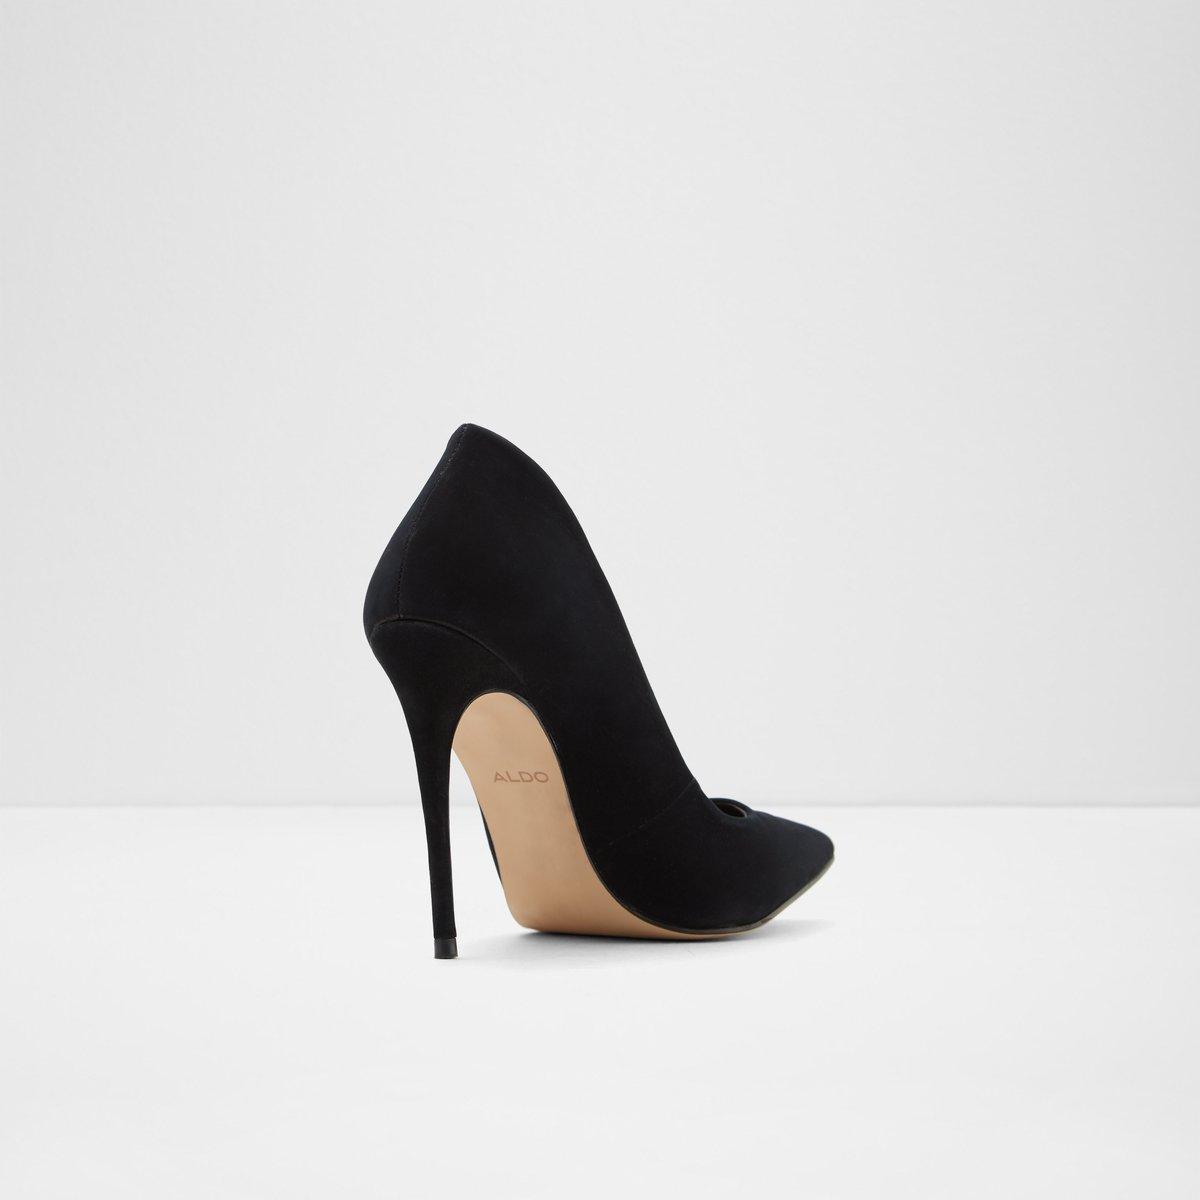 ac986dd0451c Cassedy Black Nubuck Women s Court shoes